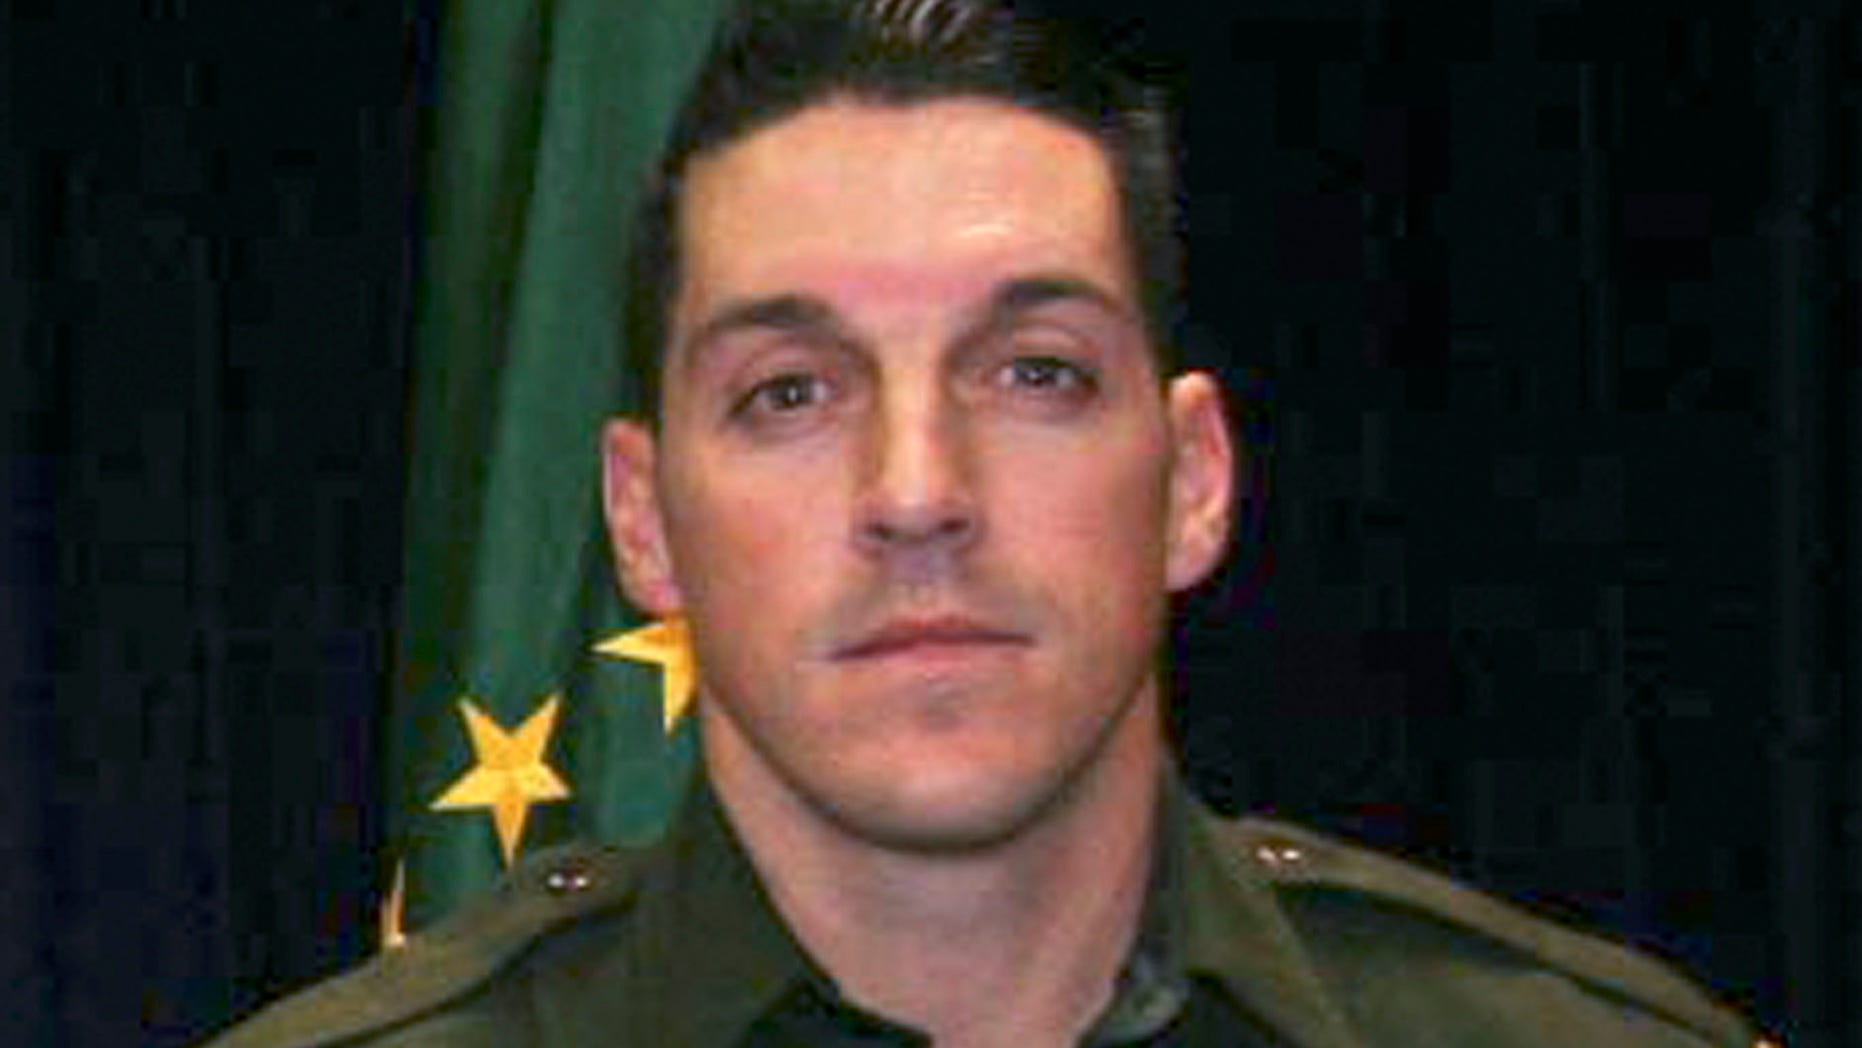 U.S. Border Patrol agent Brian A. Terry was fatally shot Dec. 14 north of the Arizona-Mexico border.